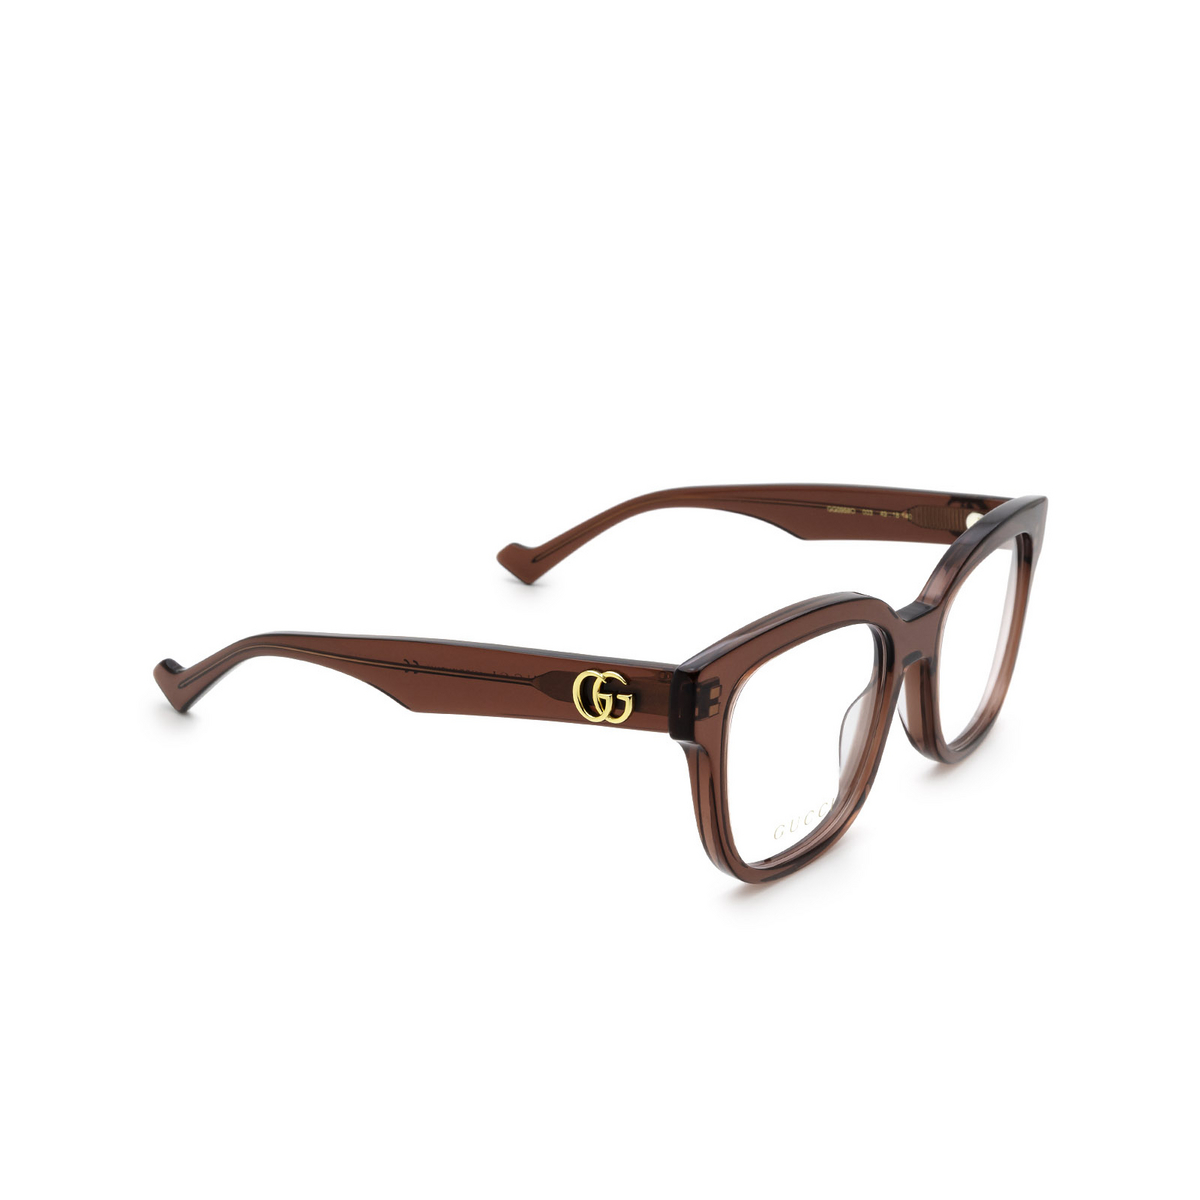 Gucci® Square Eyeglasses: GG0958O color Burgundy 003 - three-quarters view.